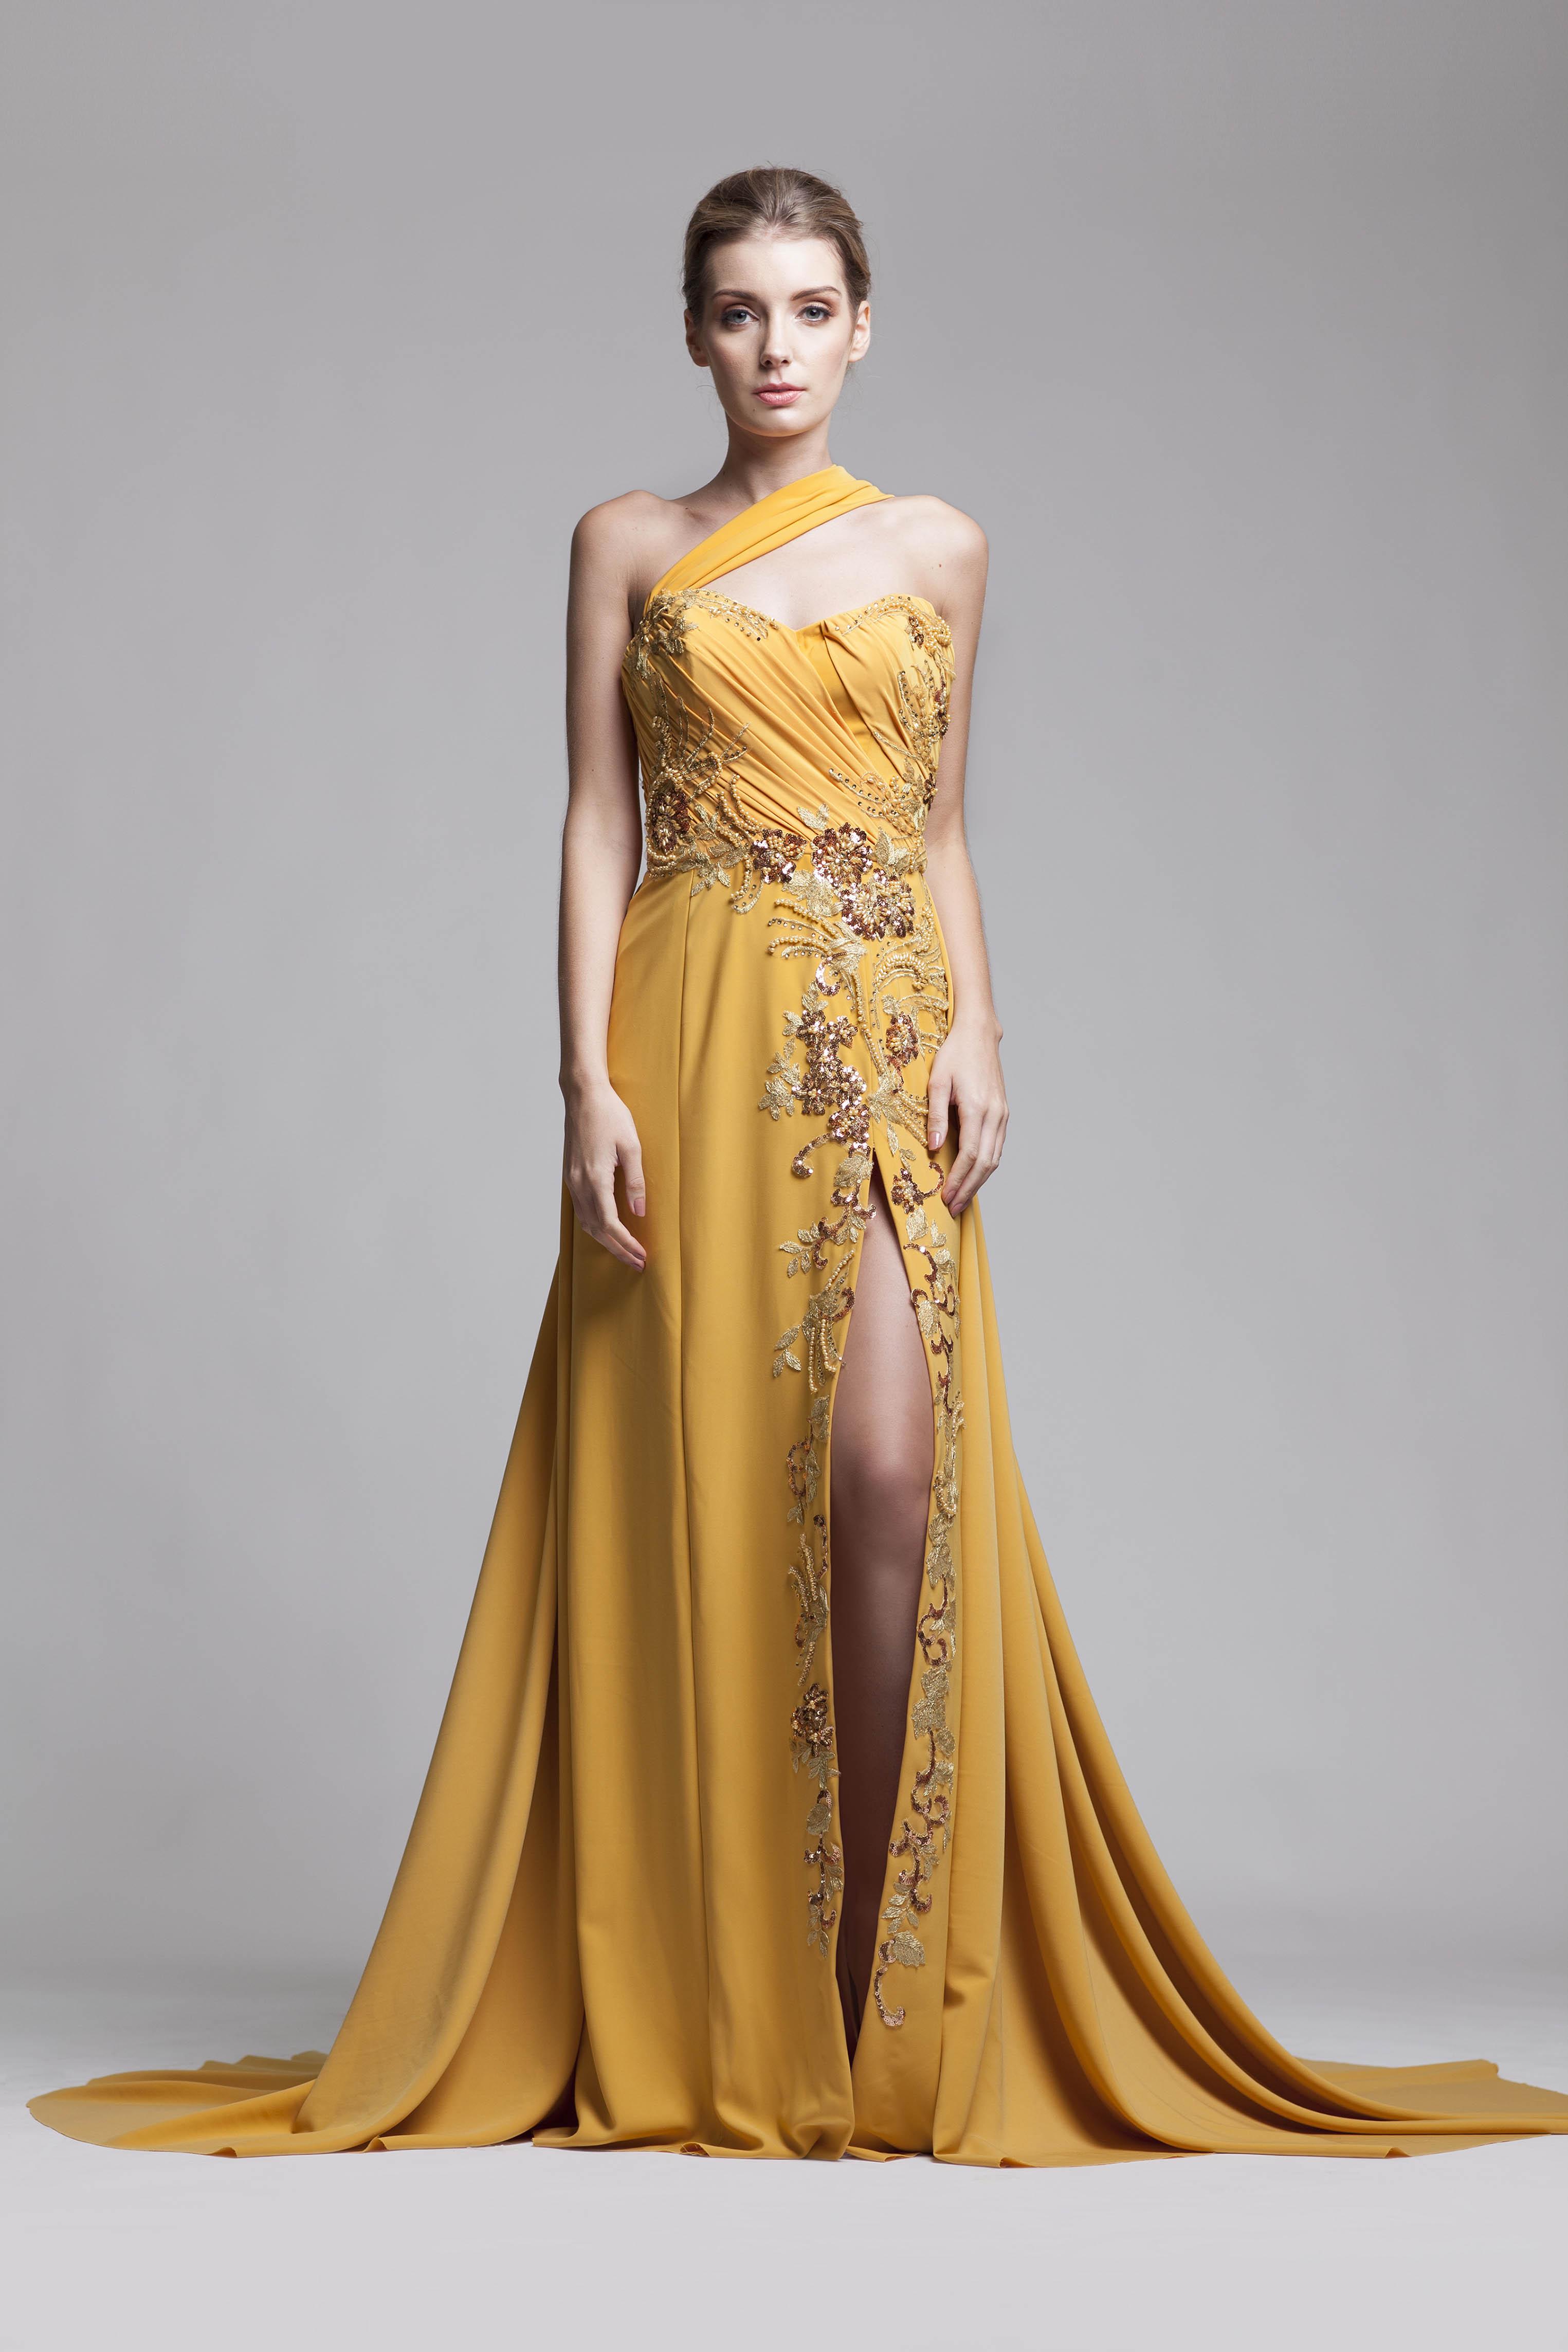 Fleur Collection Camille Garcia Bridal Couture